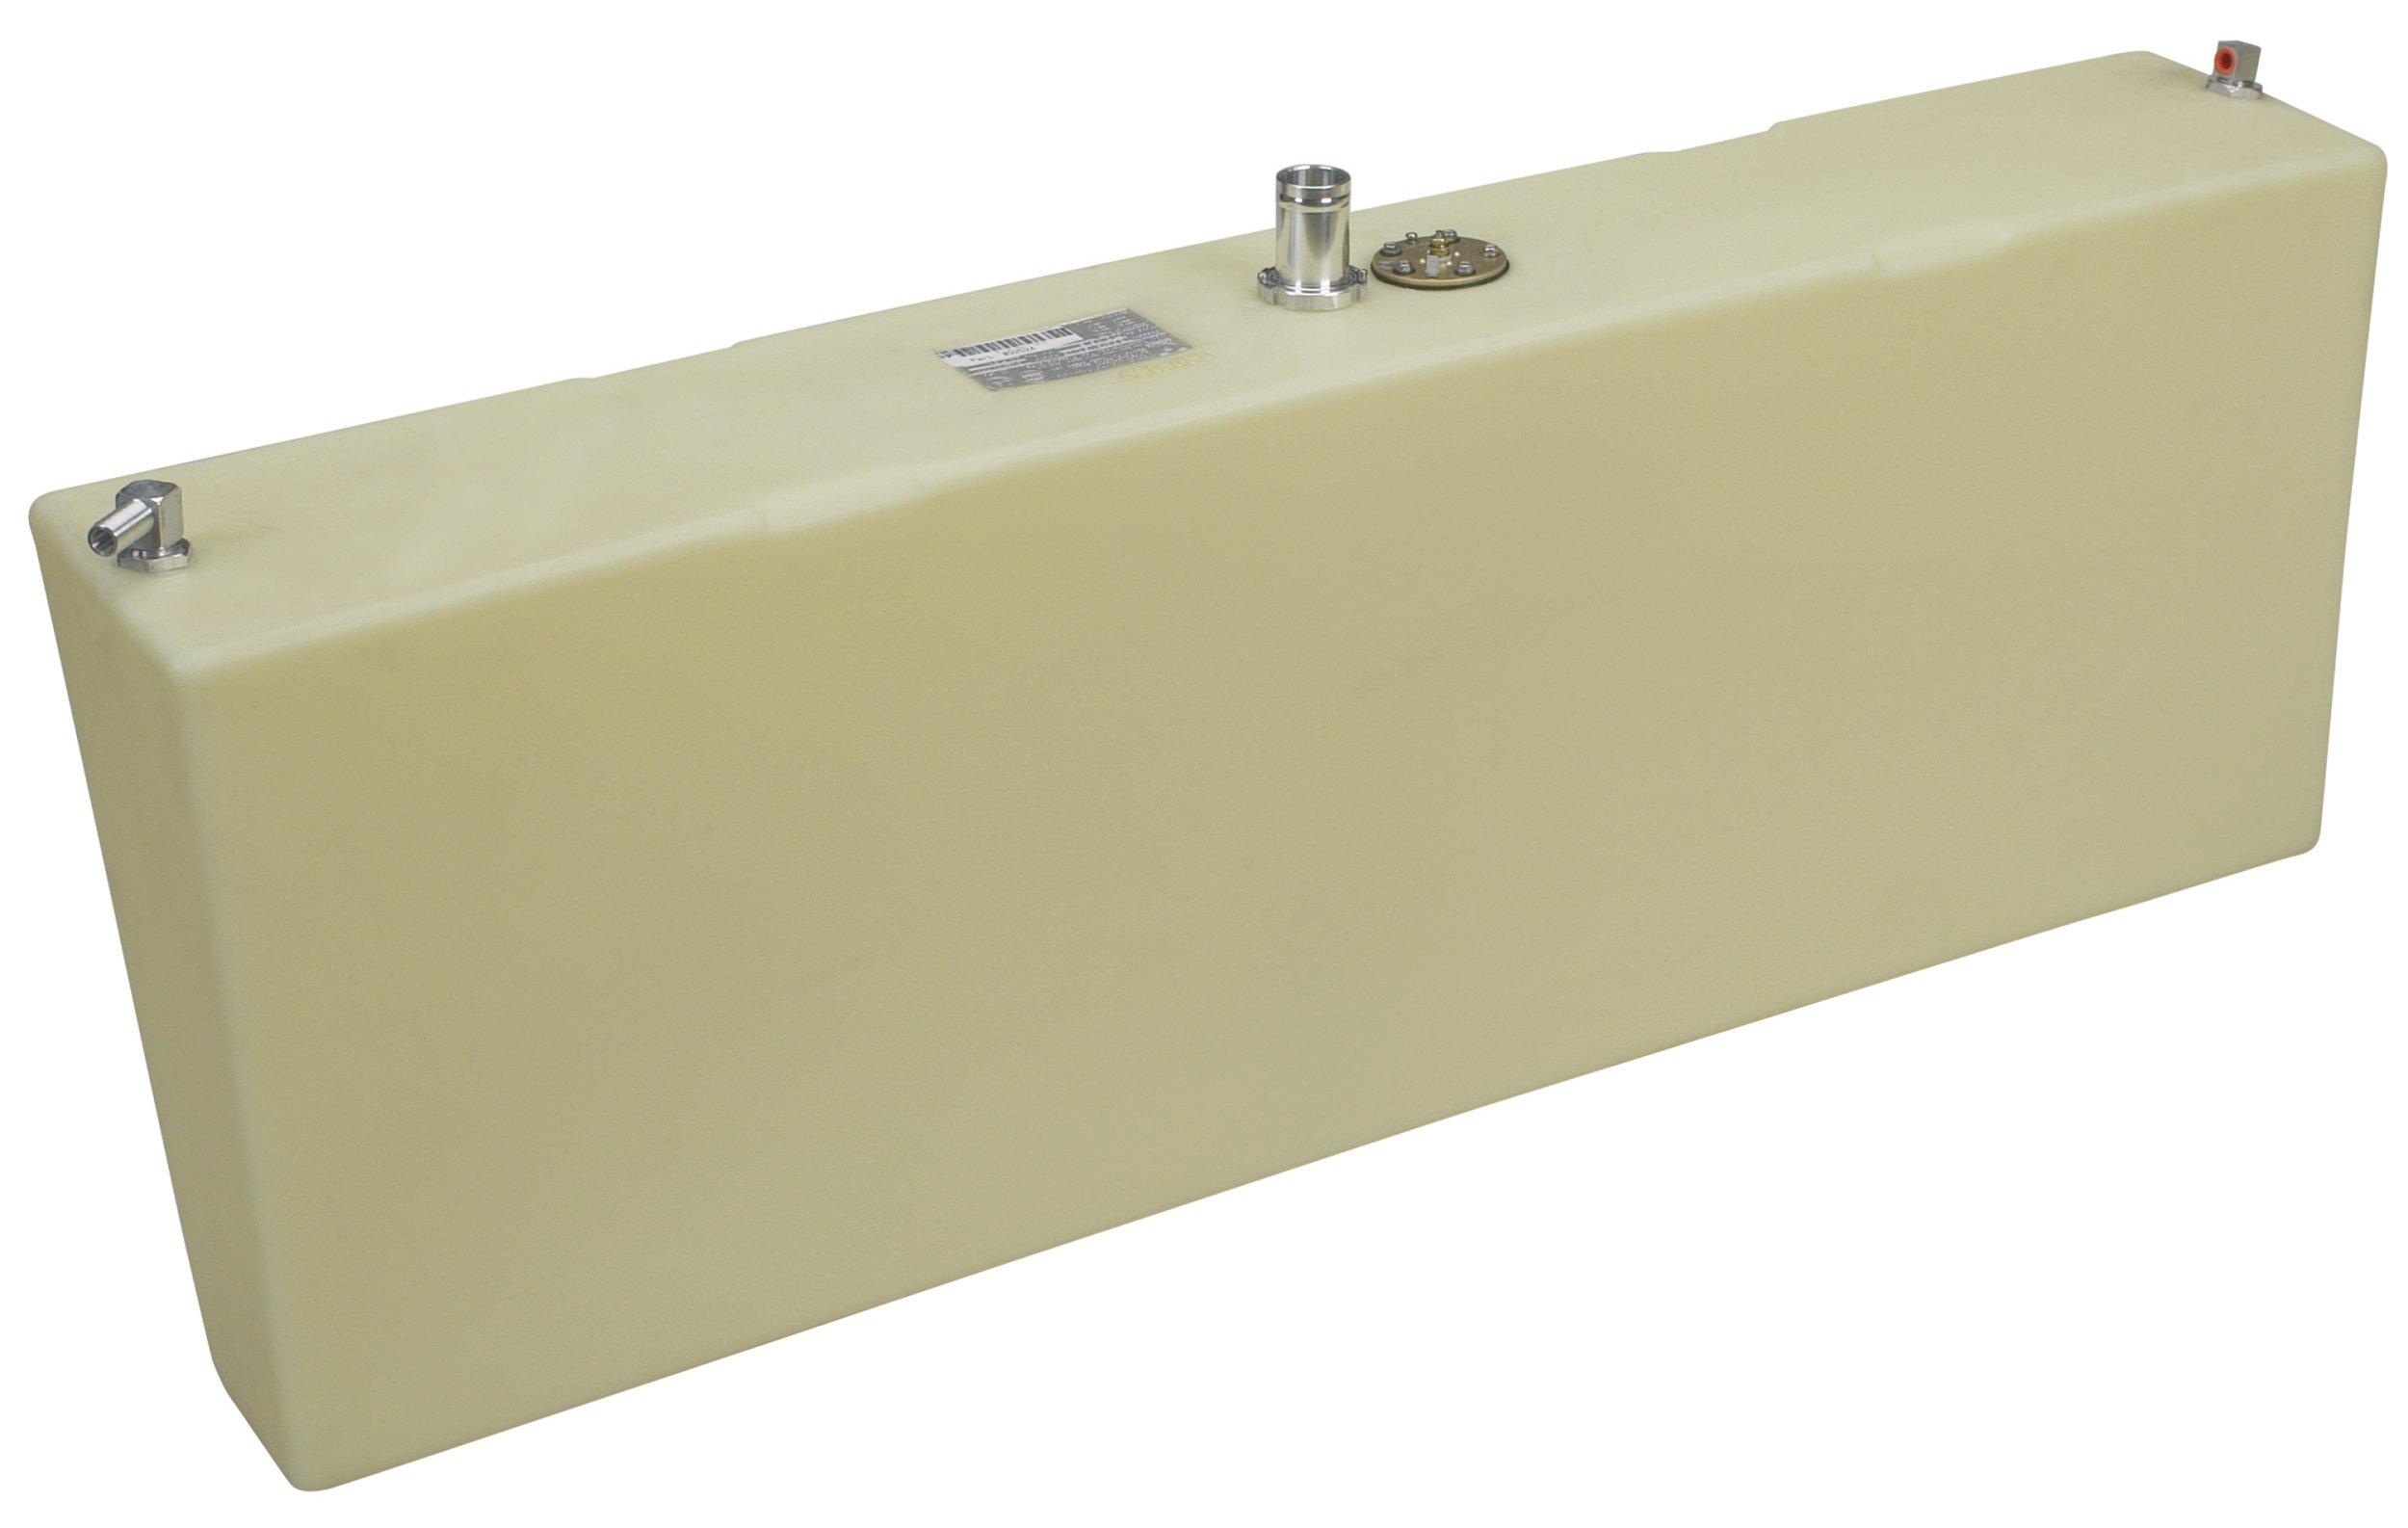 Moeller Marine Below Deck Permanent Fuel Tank with Port Side Withdraw (24-Gallon, 51'' x 8.75'' x 5.25'' x 17.88'')